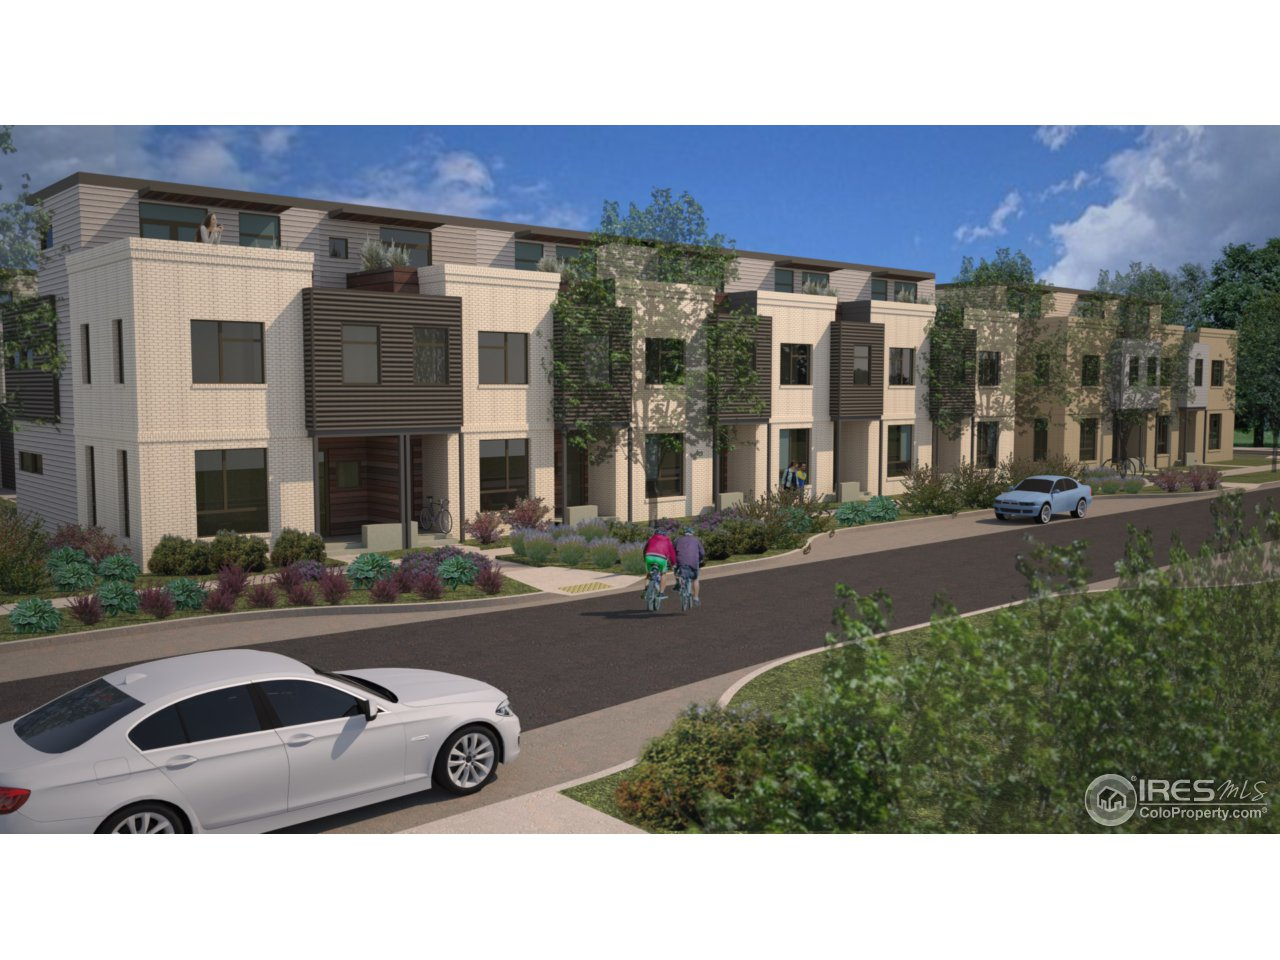 3103 Bluff St, Boulder CO 80301